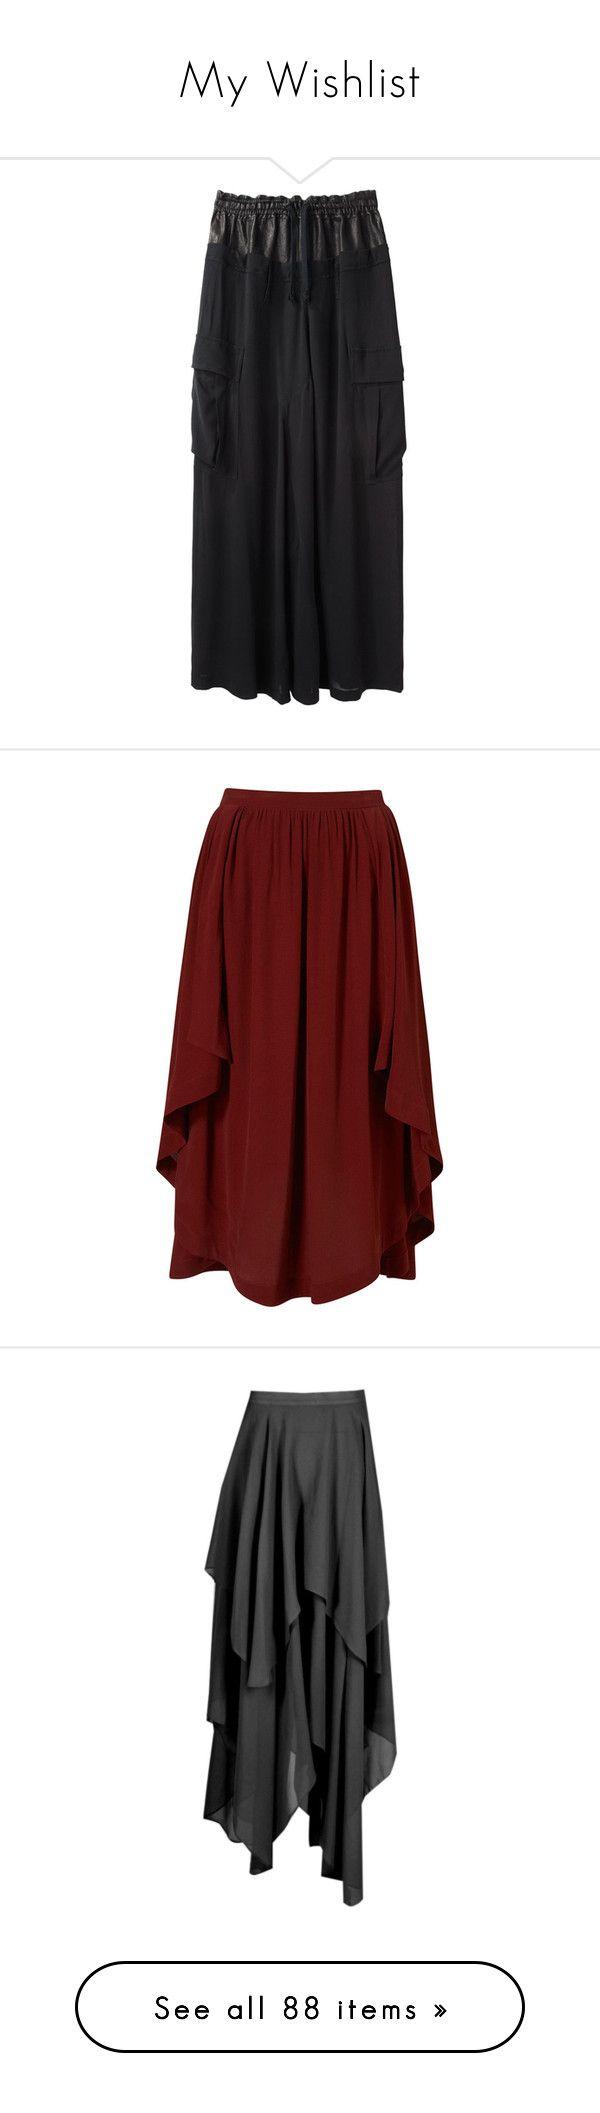 """My Wishlist"" by mxbatfiend ❤ liked on Polyvore featuring goth, darkmori, stregafashion, skirts, maxi skirts, long gathered skirt, ruched maxi skirt, sheer maxi skirt, leather maxi skirt and leather skirt"